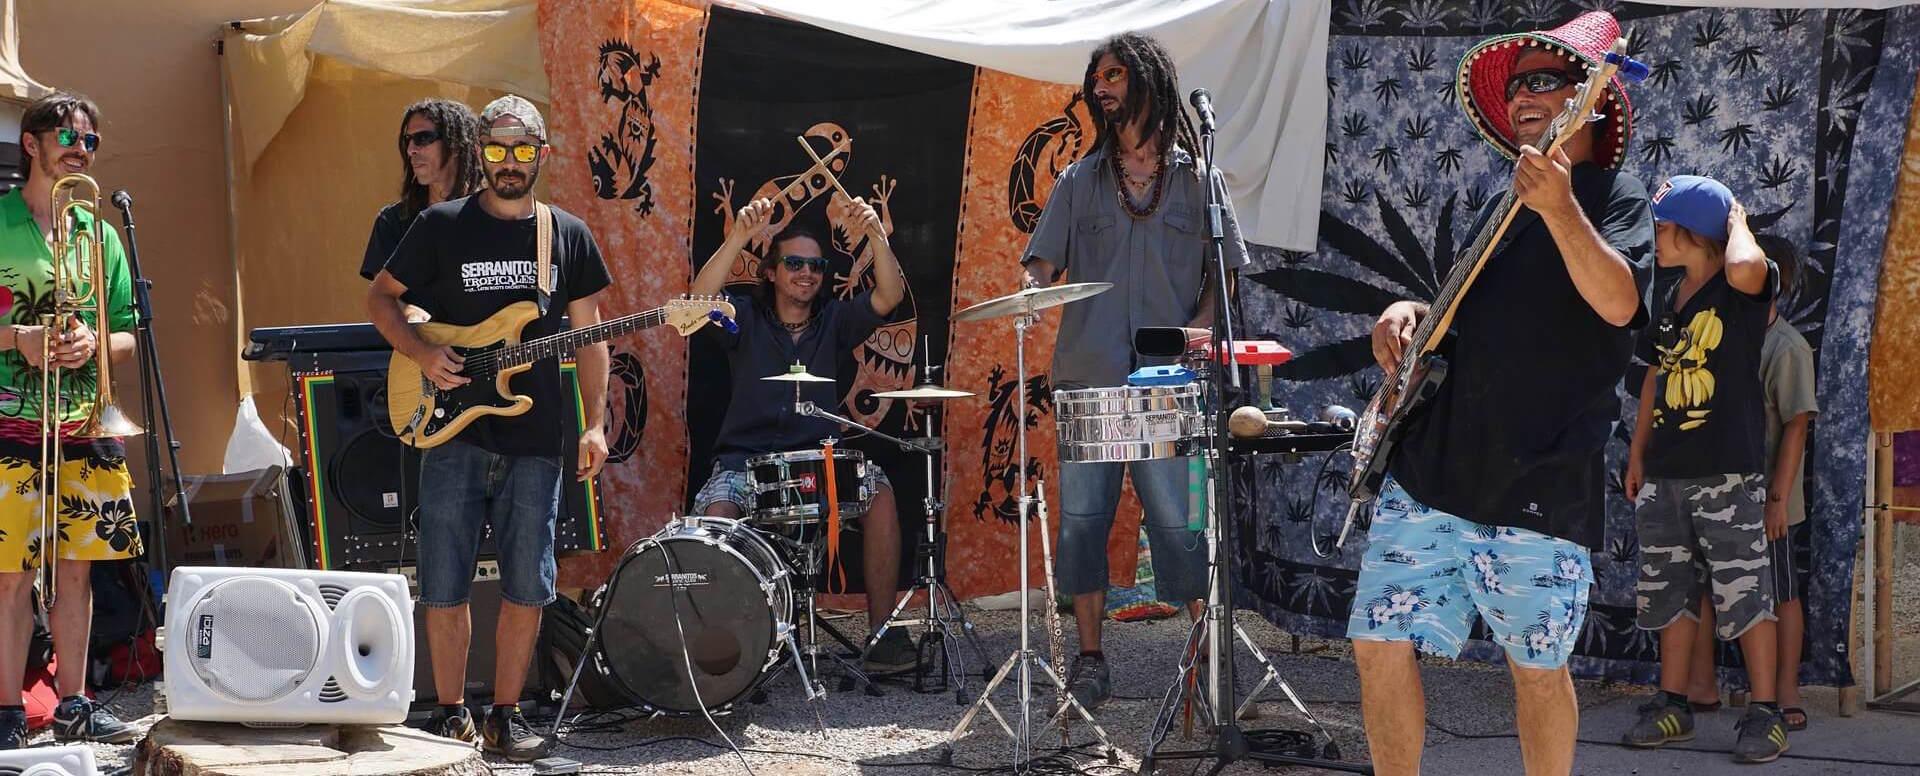 2 - Stroll through the hippie market stalls - Ibiza